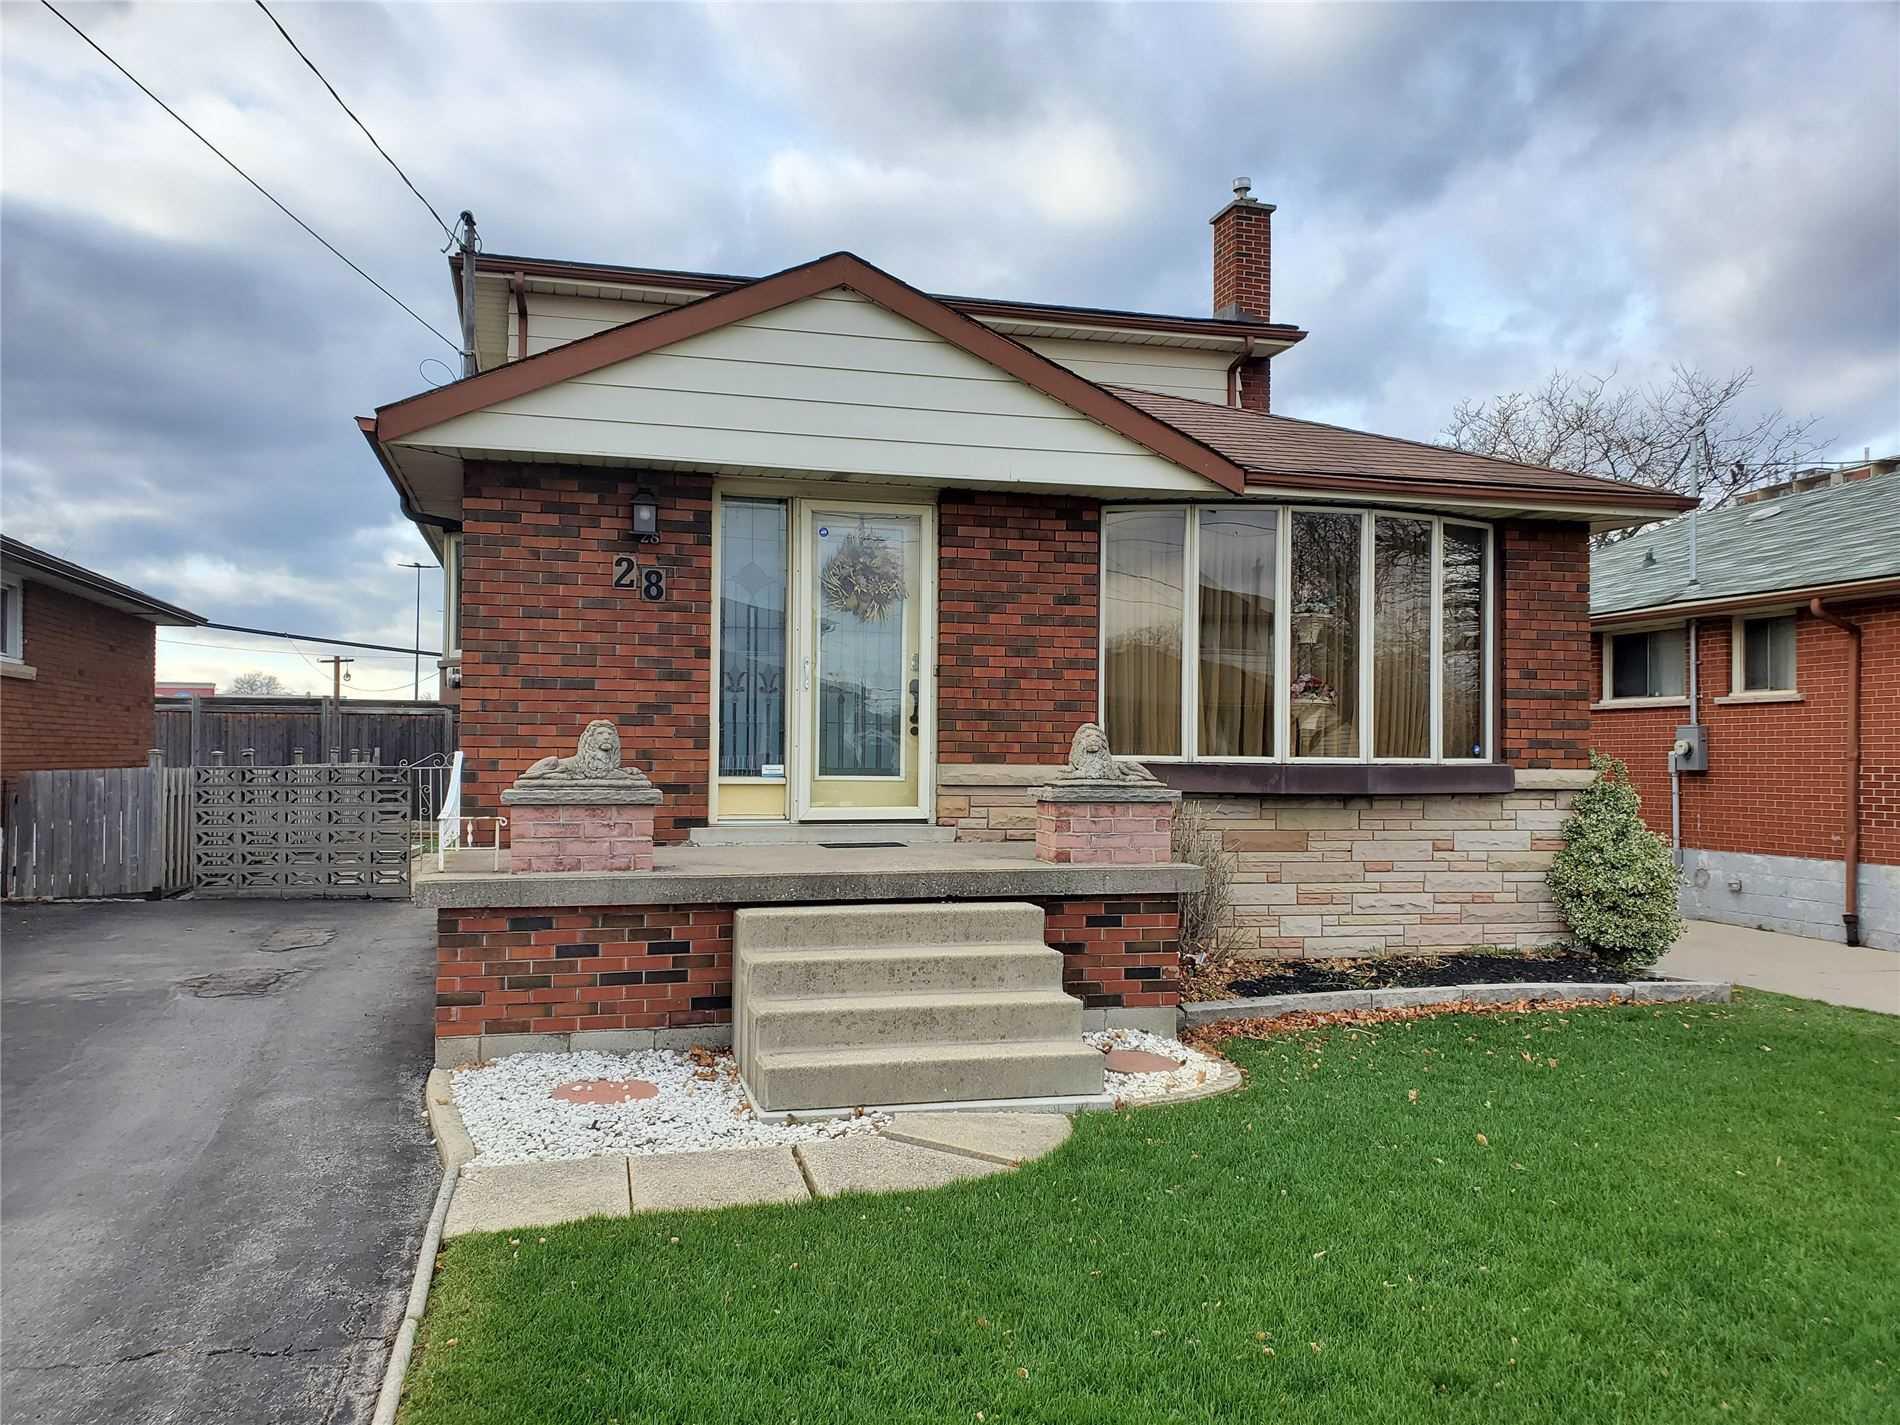 For Sale: 28 Terrace Drive, Hamilton, ON | 4 Bed, 2 Bath House for $574913.00. See 2 photos!